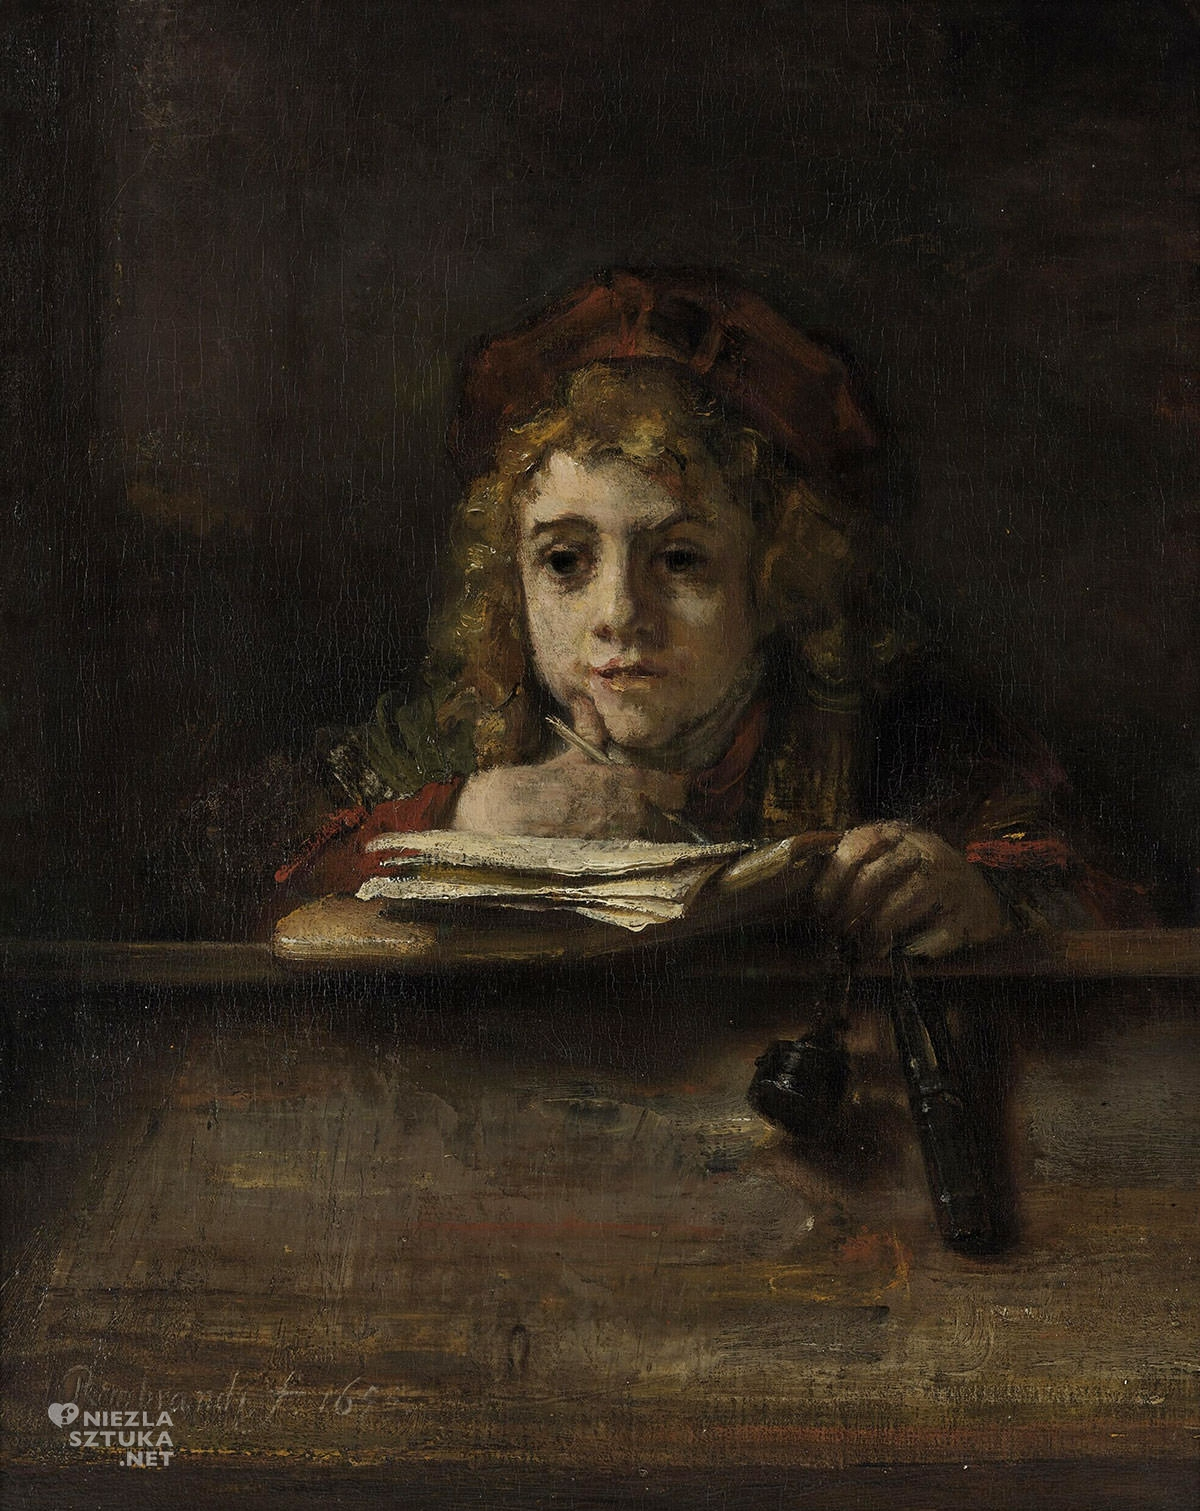 Rembrandt, Rembrandt van Rijn, Tytus przy biurku, syn malarza, sztuka niderlandzka, malarstwo niderlandzkie, Niezła Sztuka